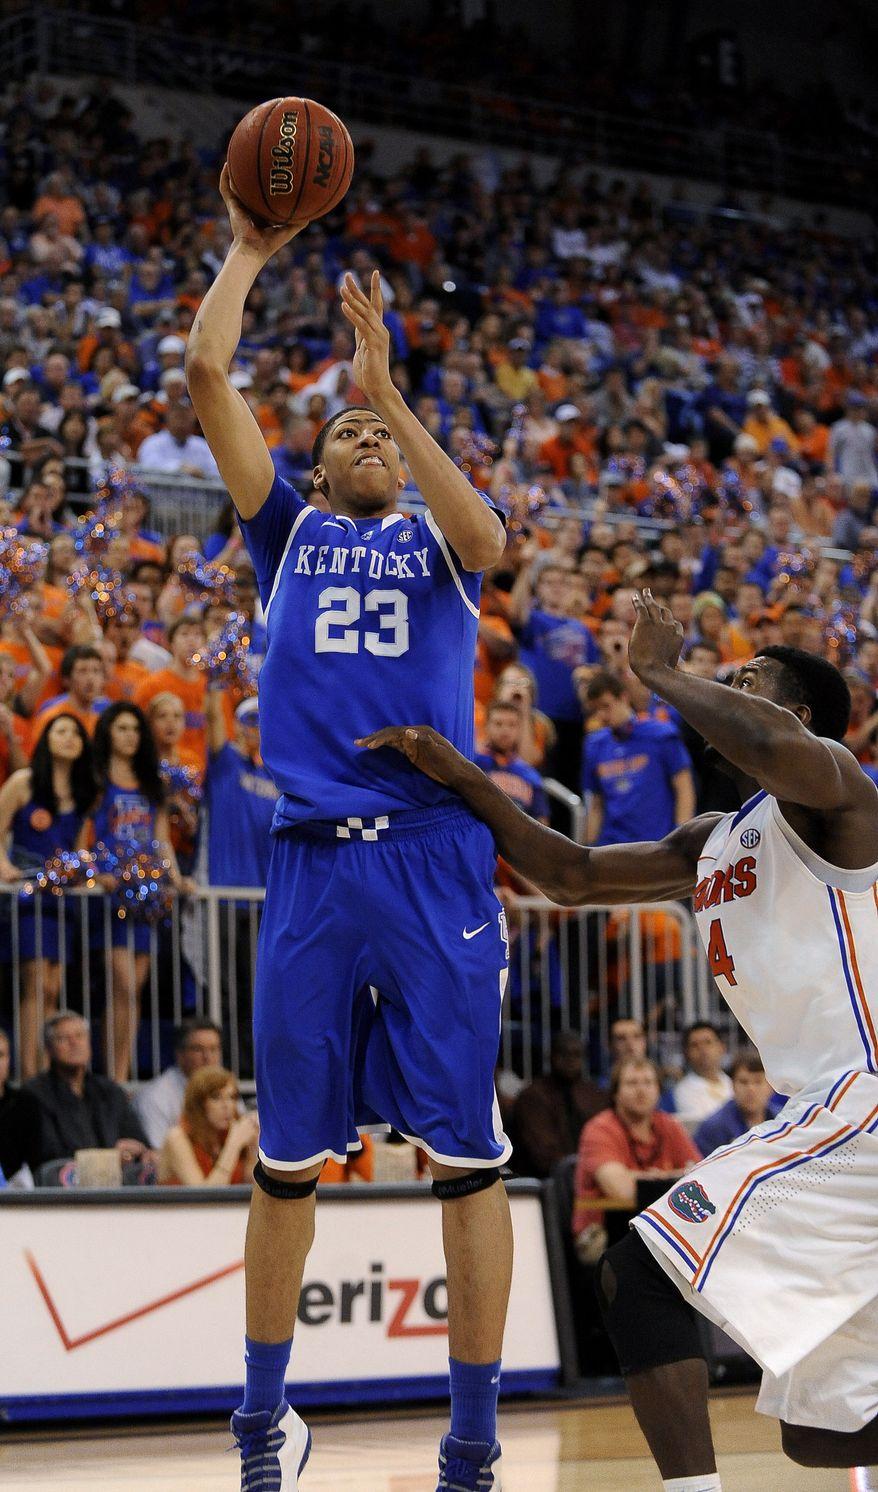 Kentucky freshman Anthony Davis is averaging 14.4 points, 9.8 rebounds and 4.7 blocks per game. AP Photo/Phil Sandlin)